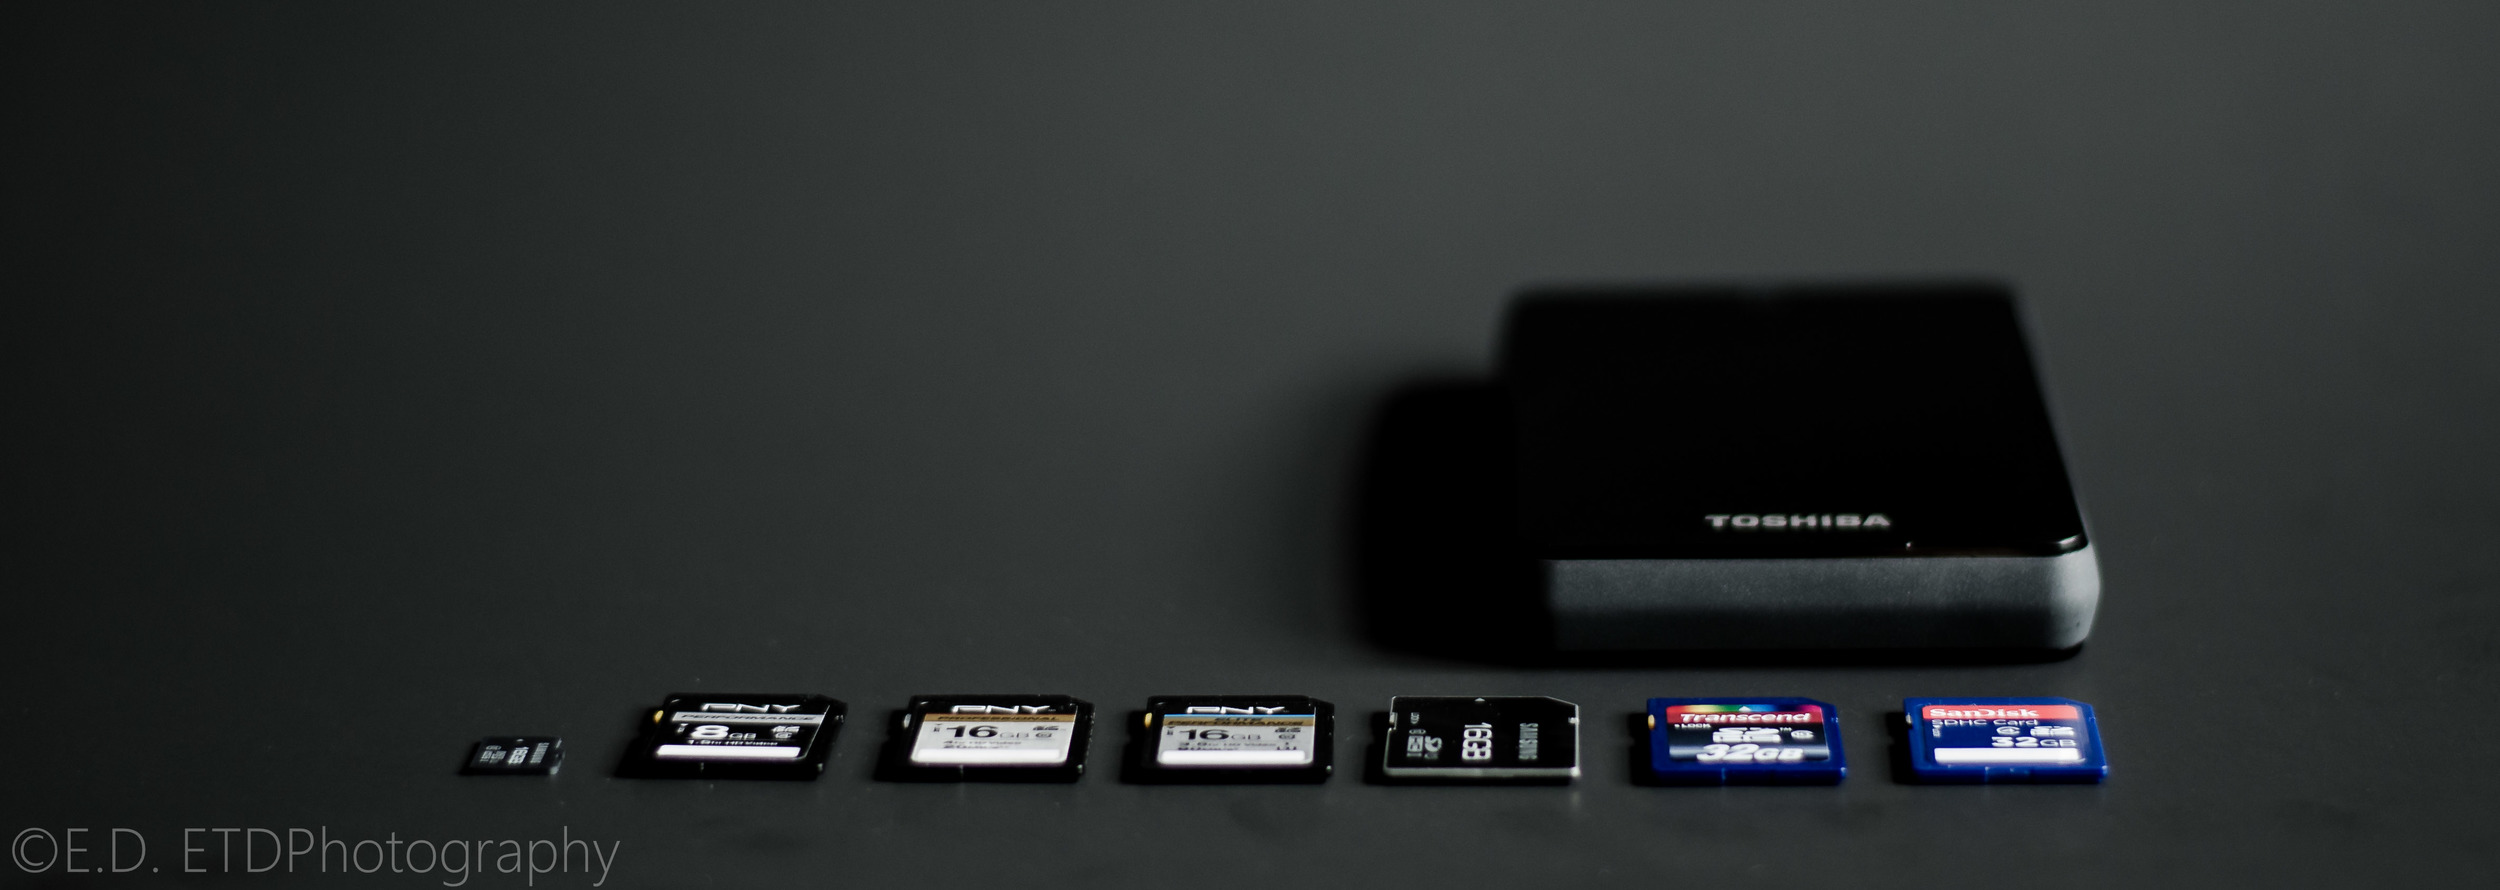 MemoryCards-1.JPG